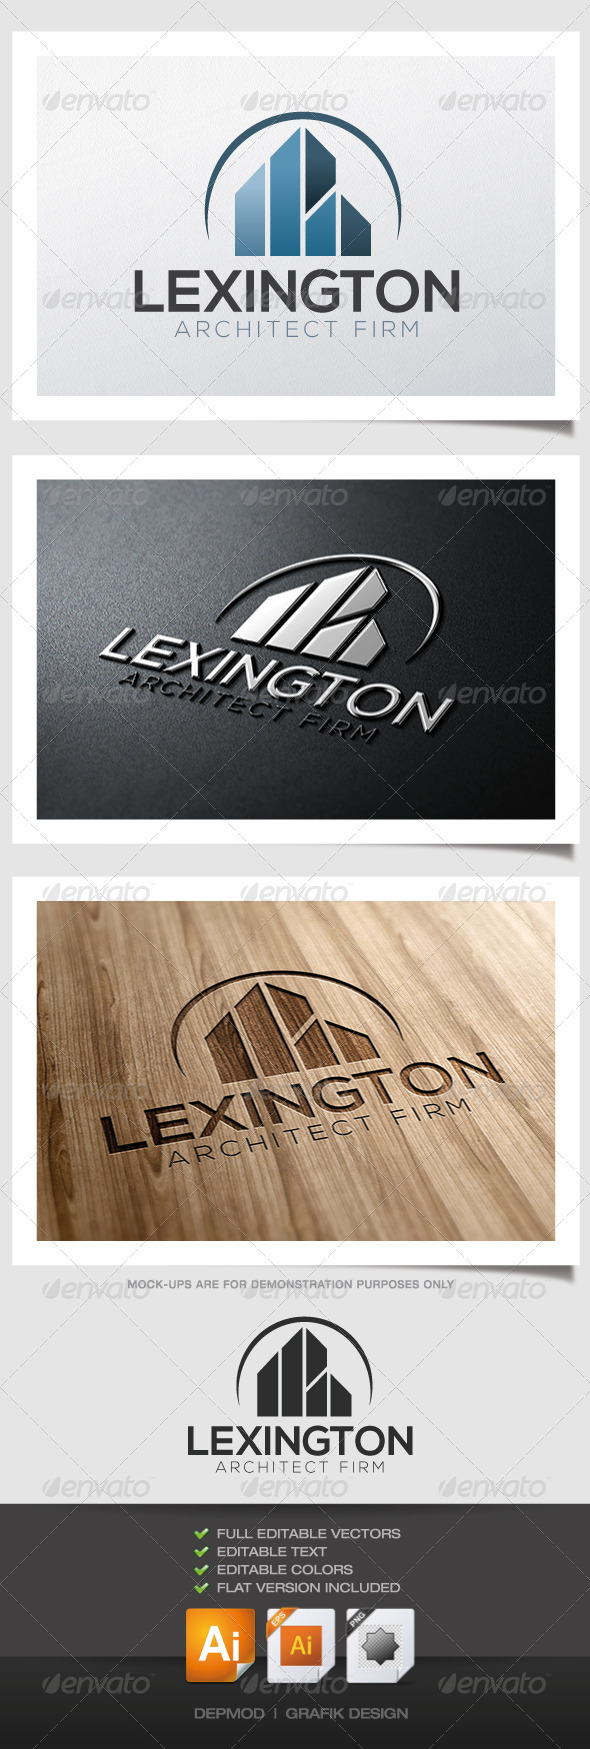 GraphicRiver Lexington Architect Logo 4718714